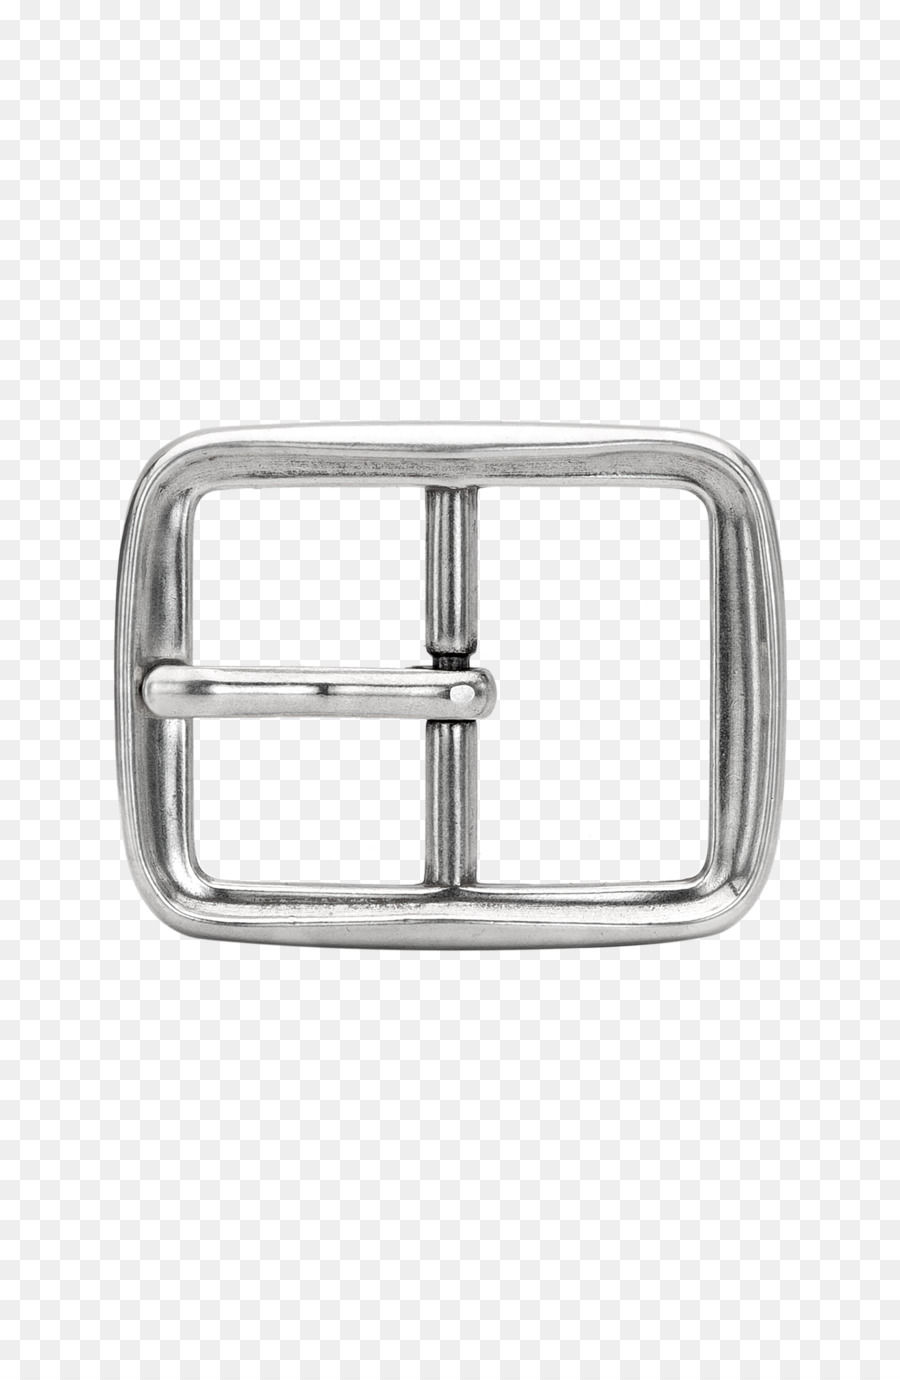 Car Cintura Fibbie Wiring Diagram Silver - Cintura Scaricare Png